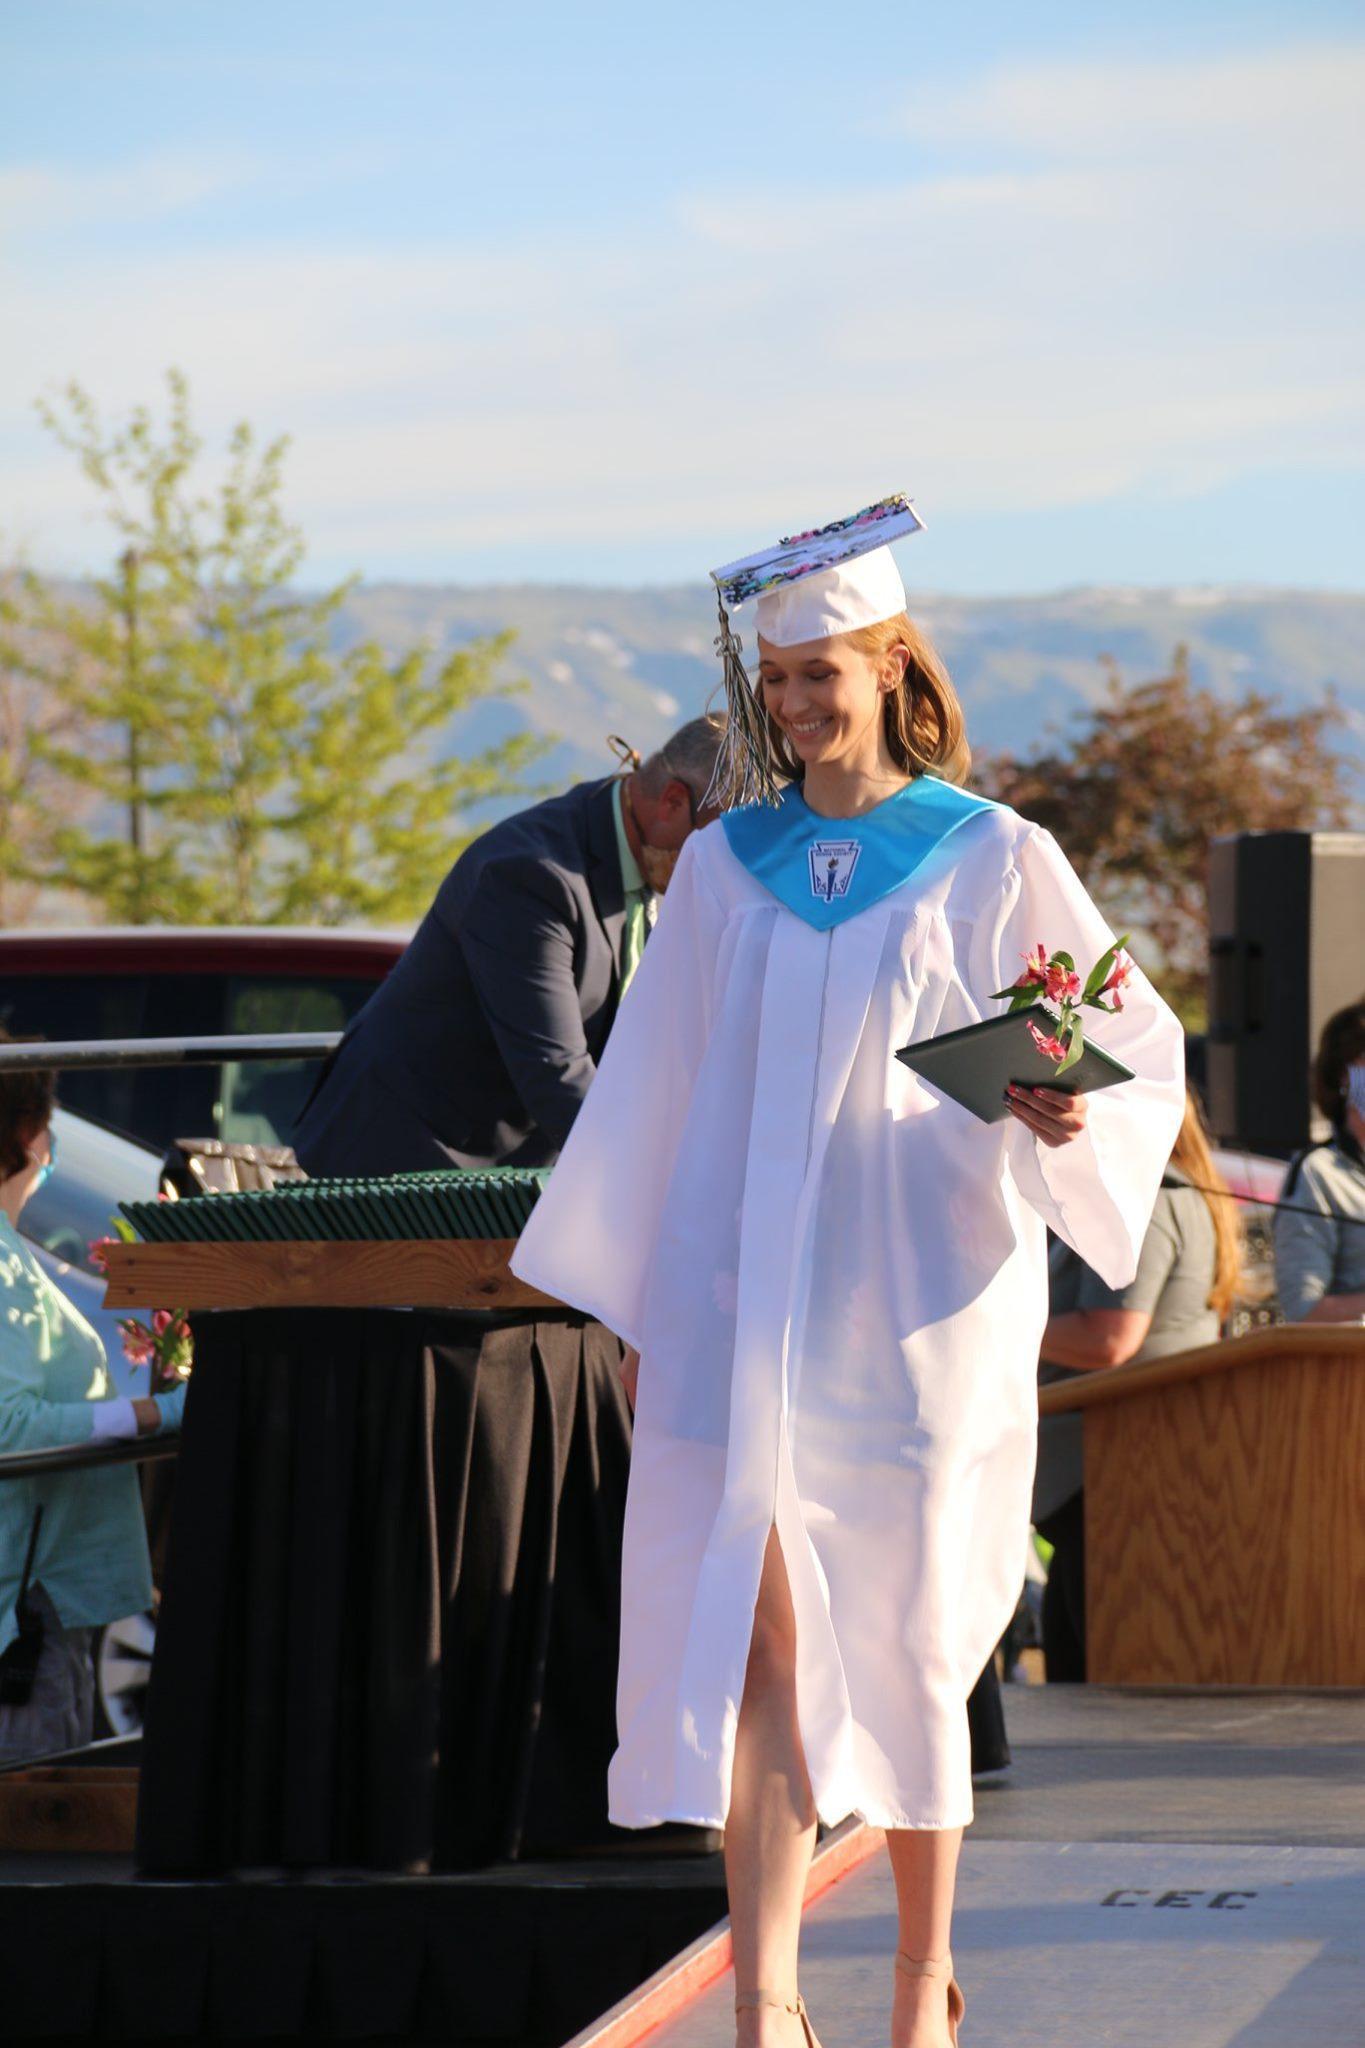 Girl walking at High School Graduation